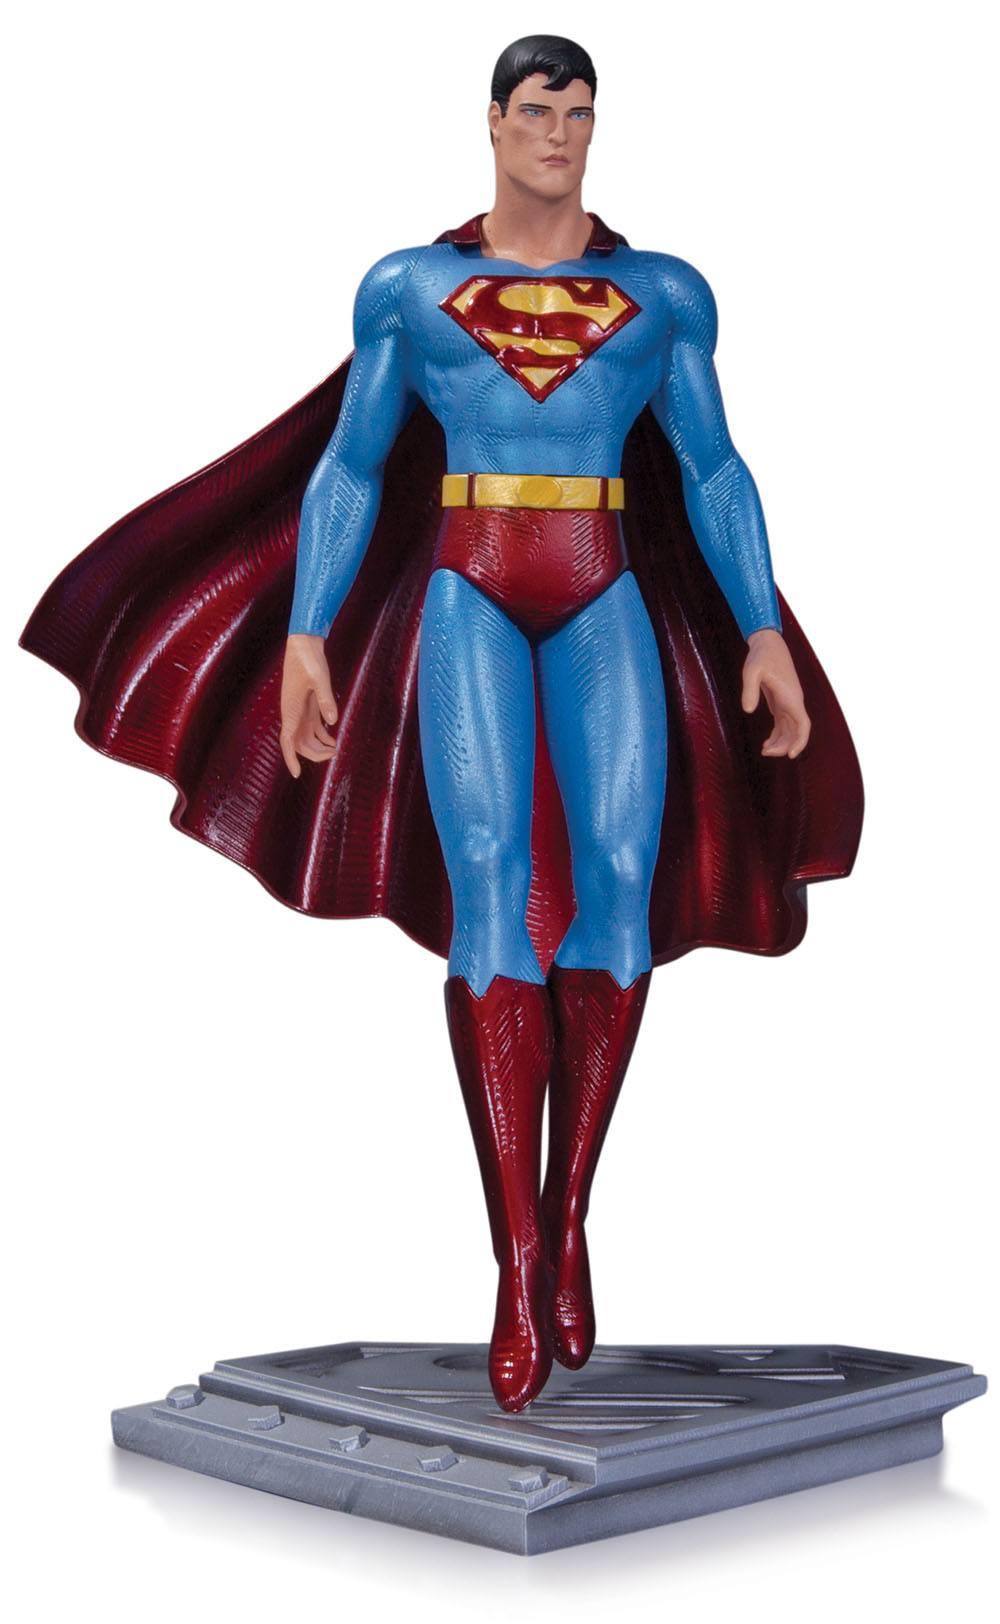 Superman The Man Of Steel Statue Moebius 20 cm